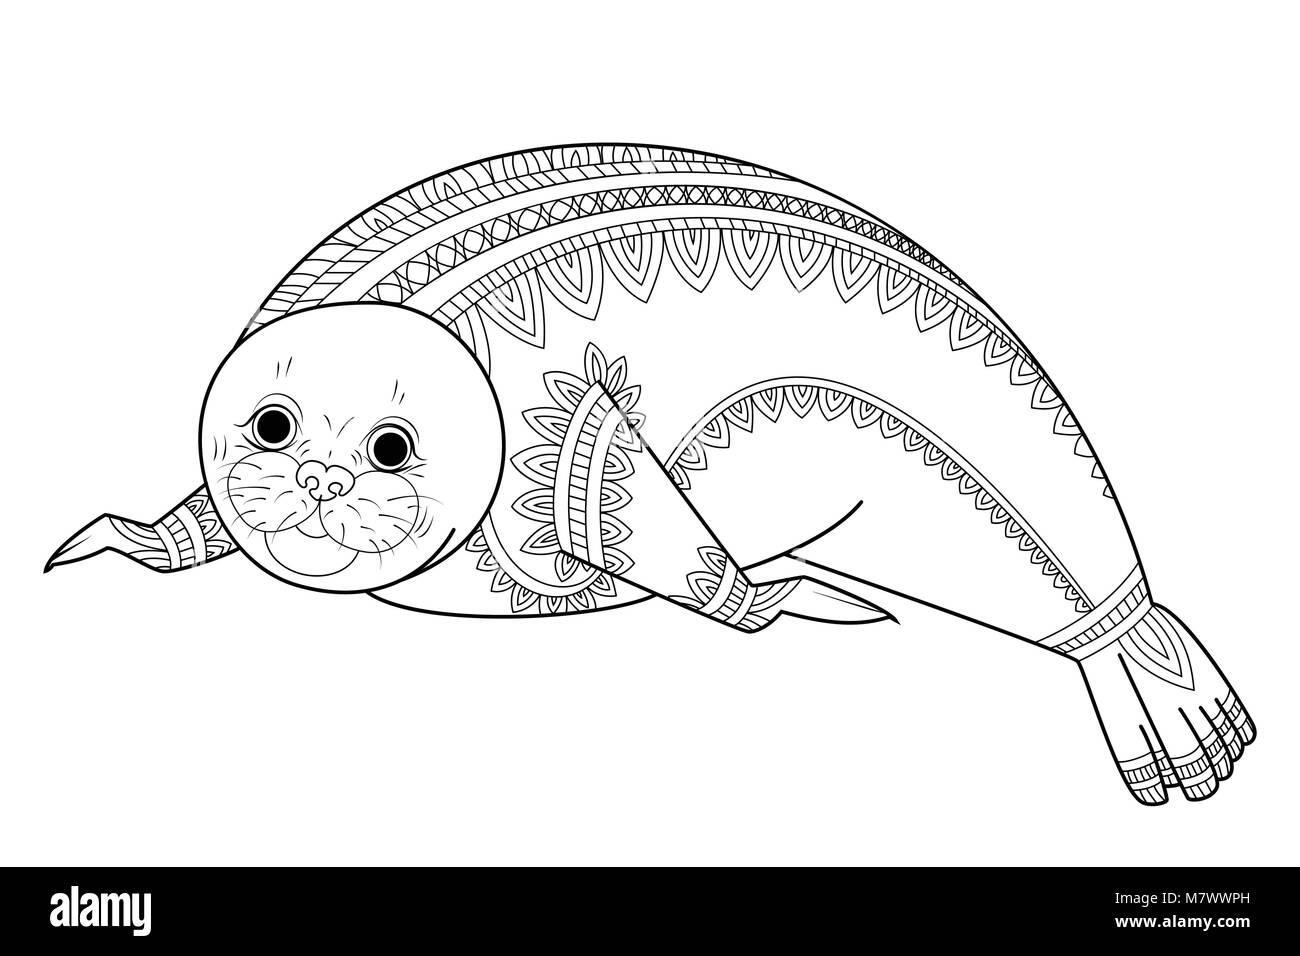 Cute Seal Zentangle Vector Illustration Phoca Zen Tangle Wild Animals Of Antarctica Coloring Book For Adult